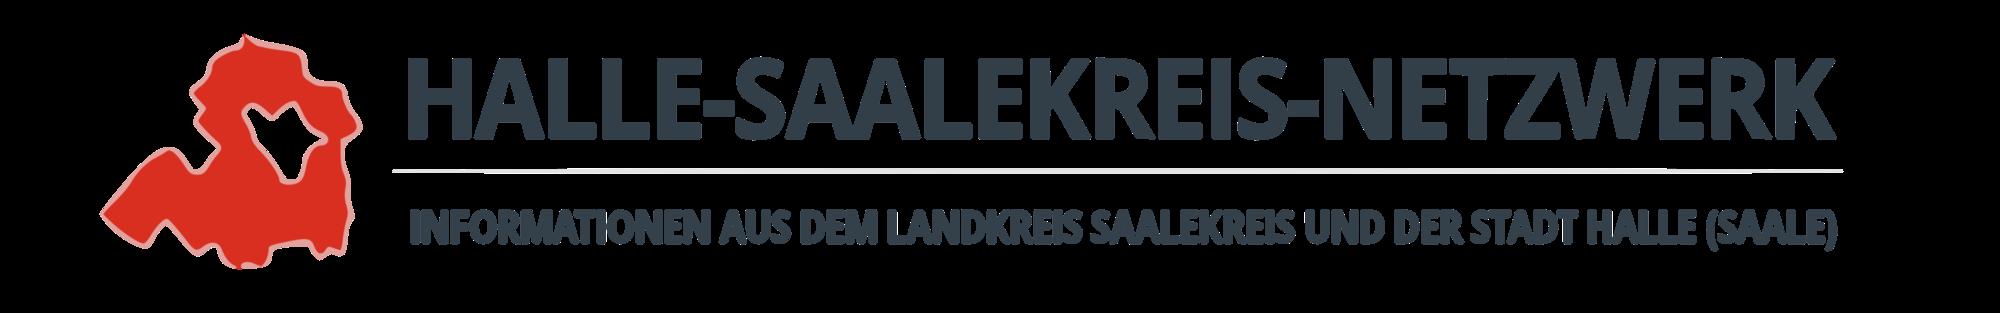 Halle-Saalekreis-Netzwerk